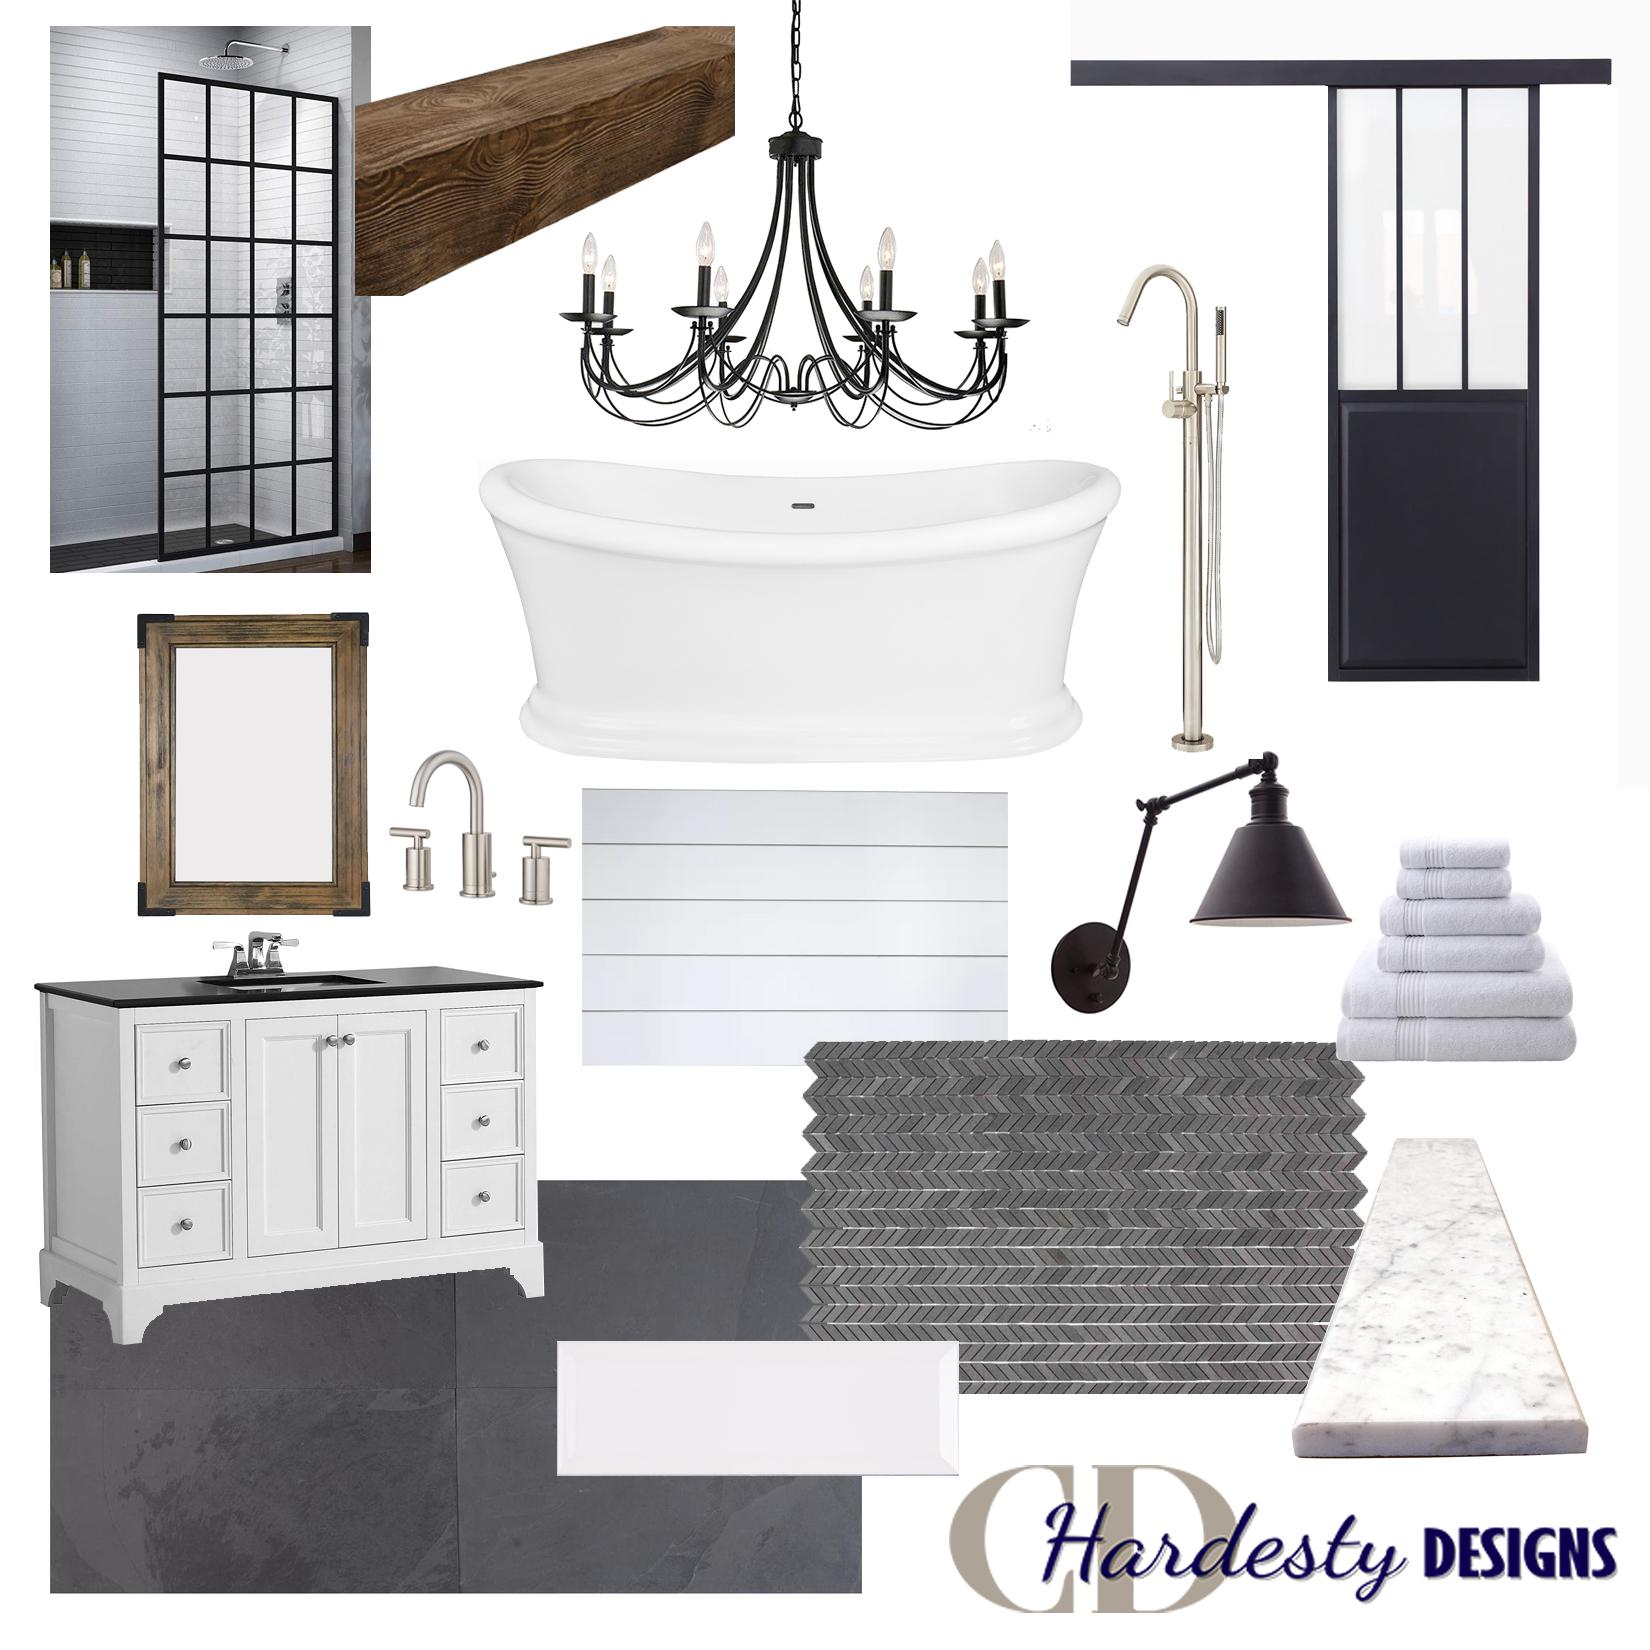 Modern farmhouse bathroom remodel concept board.